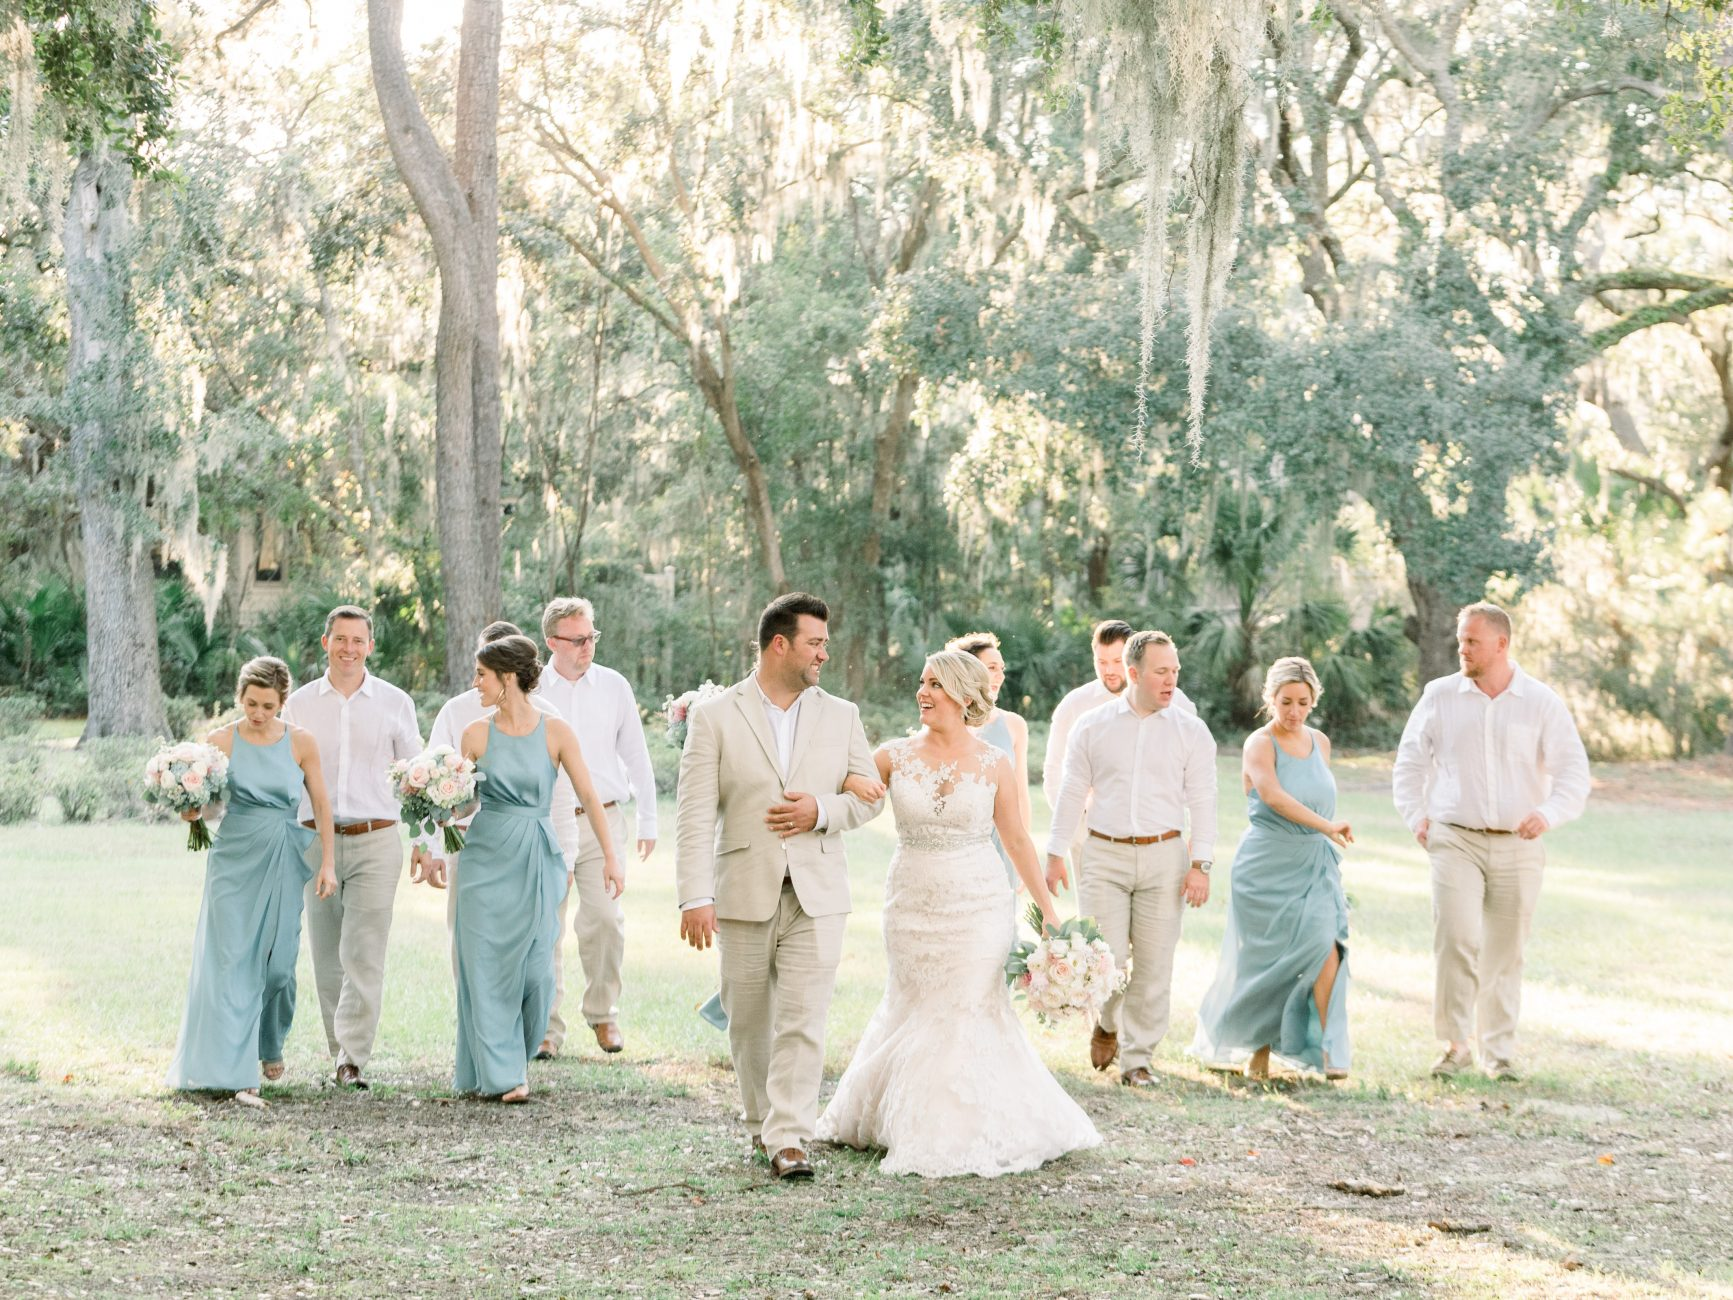 hilton head island wedding photographer wedding party sea pines resort spanish moss 24 sandhill crane blue wedding party group